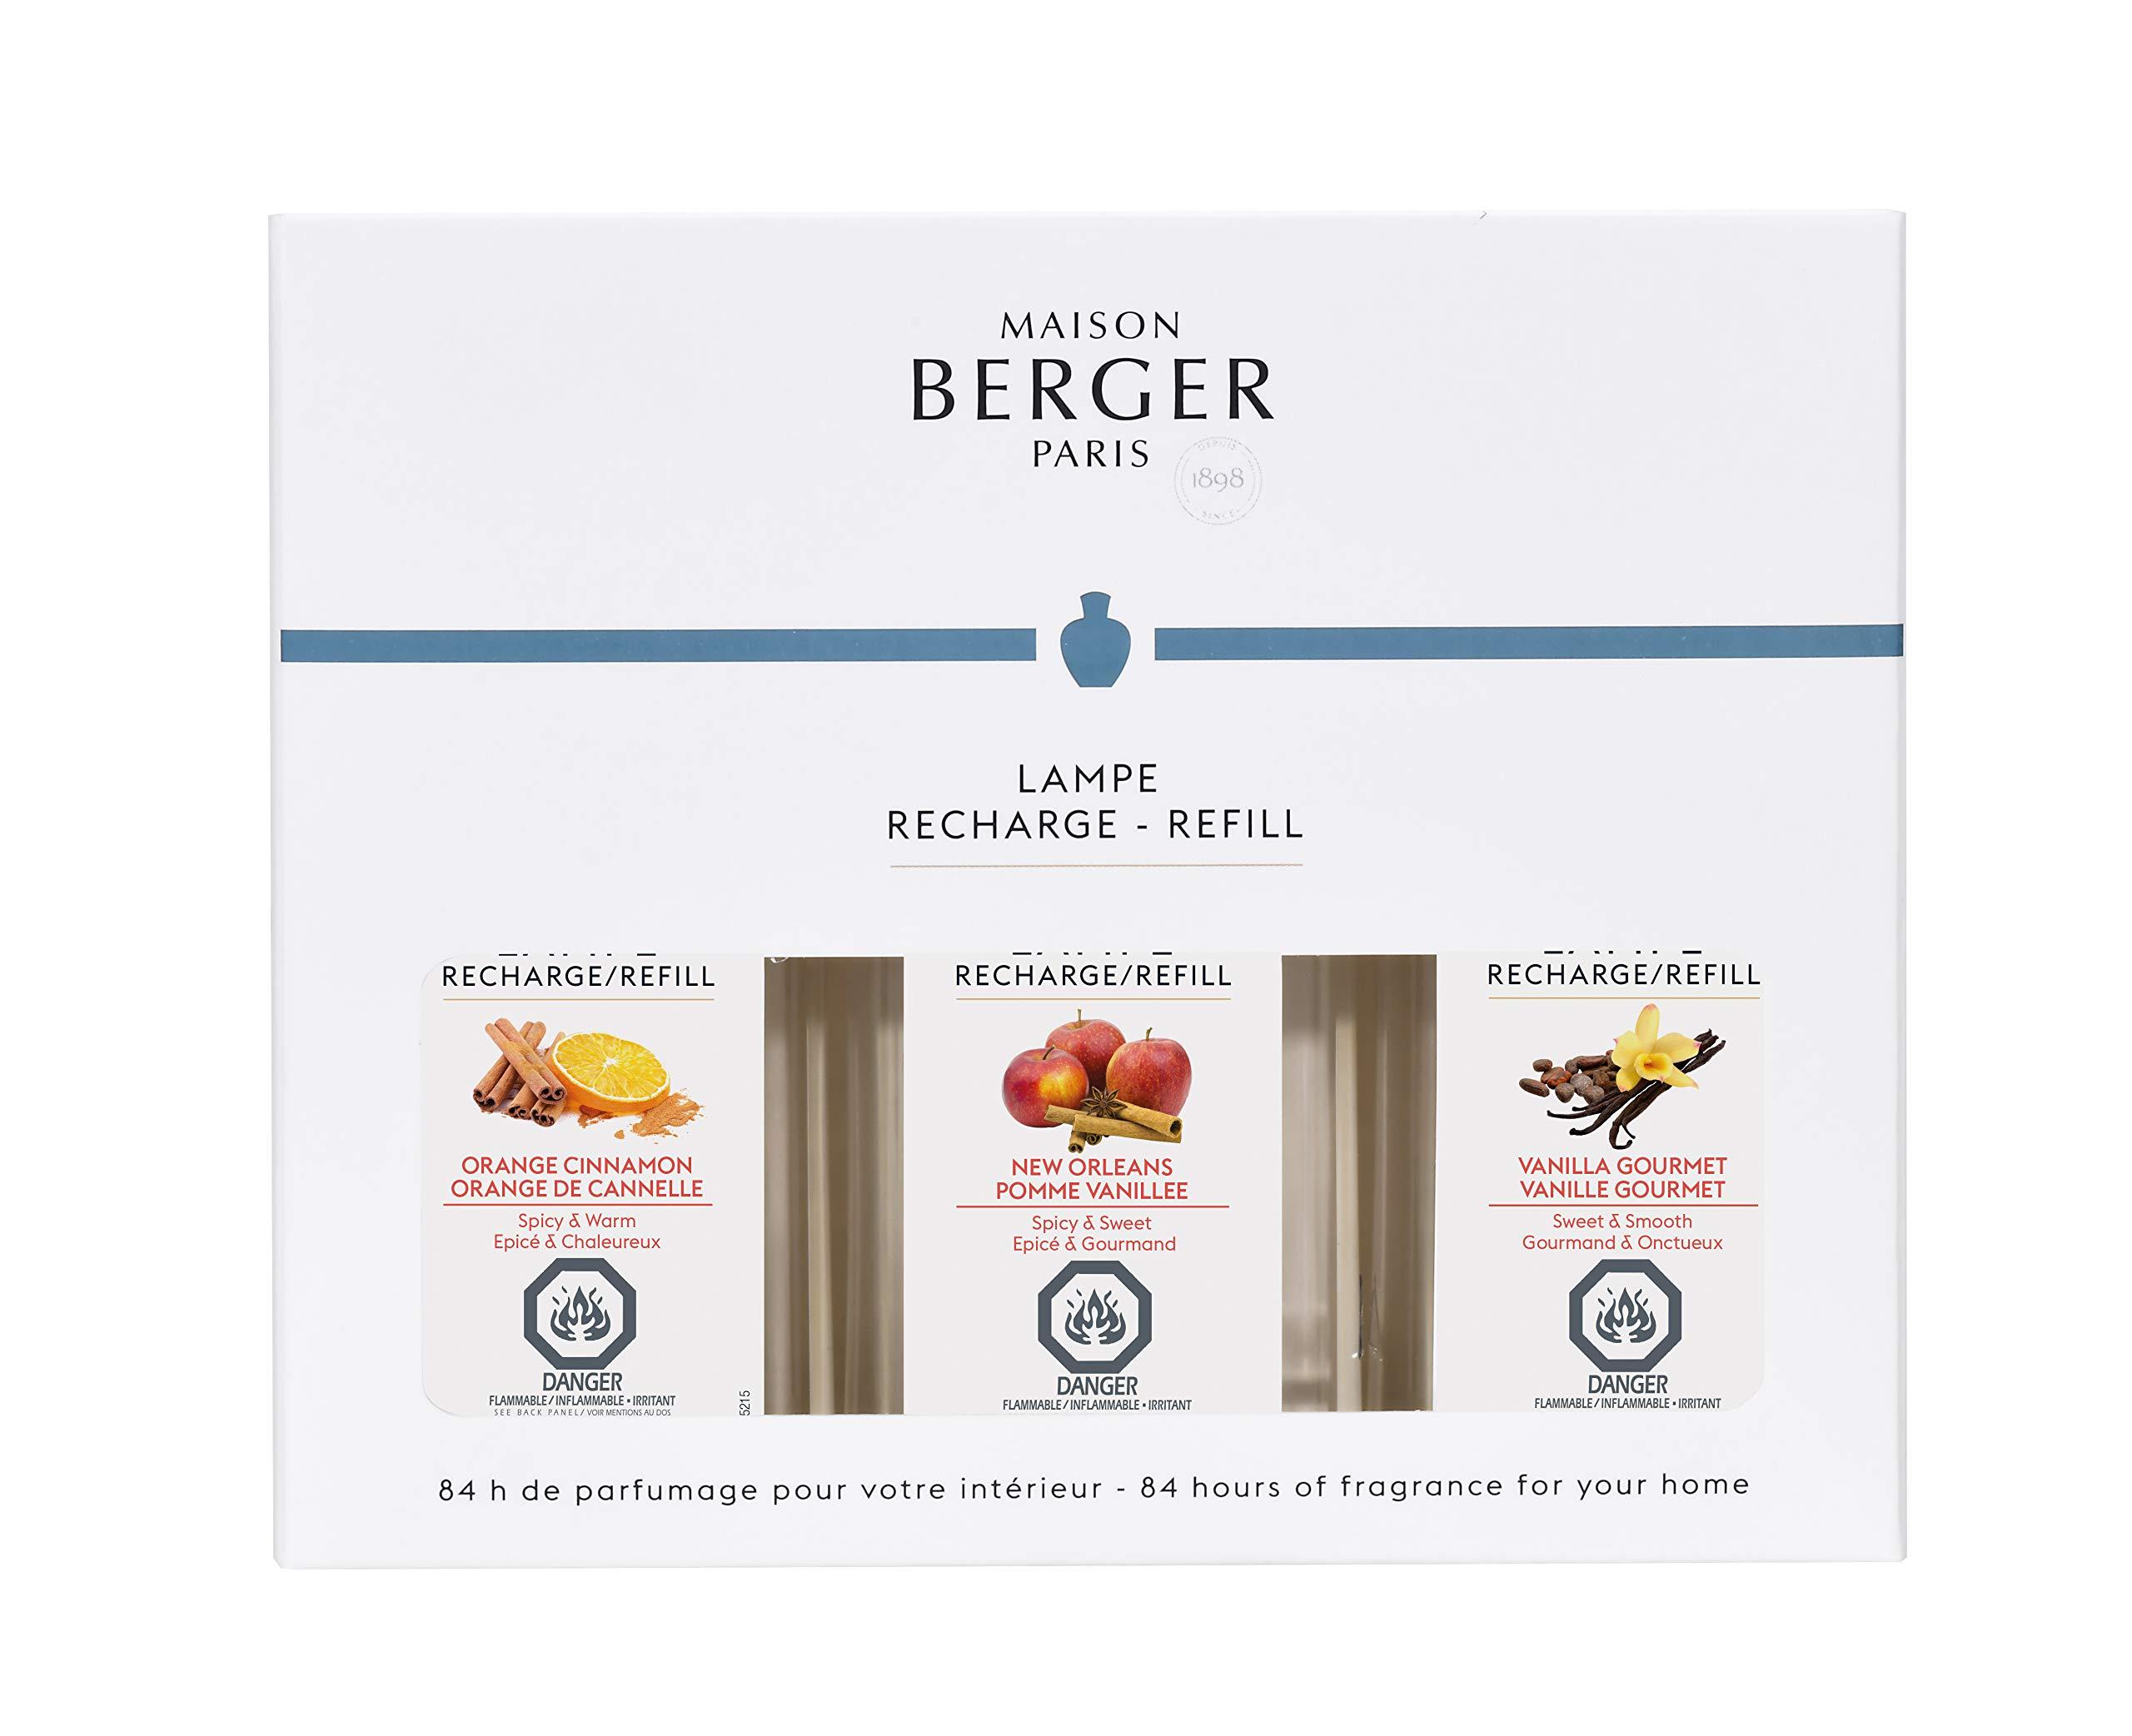 Lampe Berger Fragrance Trio Pack Warm, New Orleans-Orange Cinnamon-Vanilla Gourmet, 3 x 180ml/6.08 fl.oz.